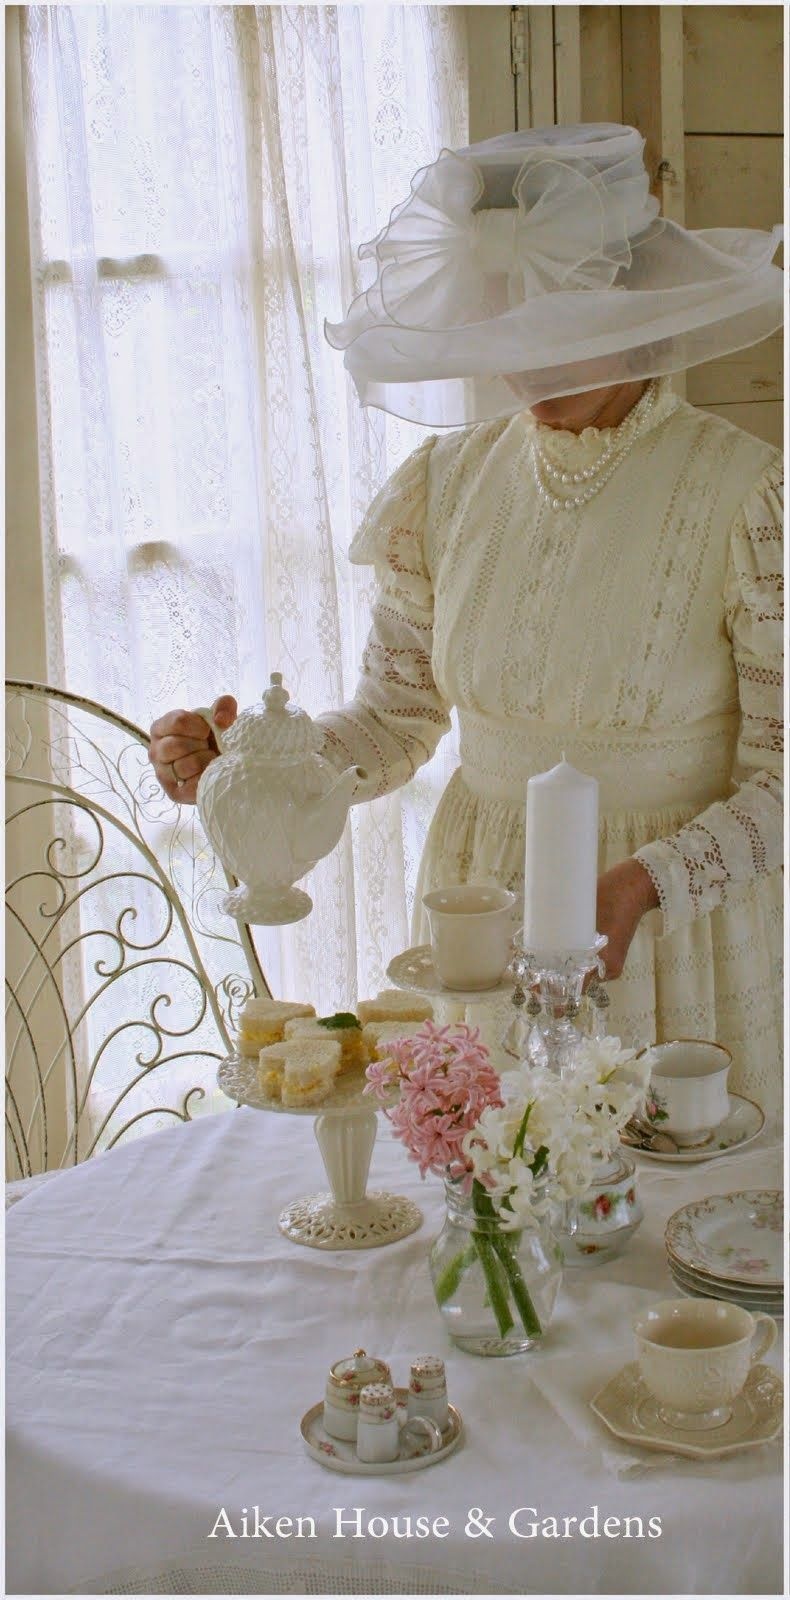 Tea Party Outfits Tea Party Dress Victorian Tea Party [ 1875 x 924 Pixel ]